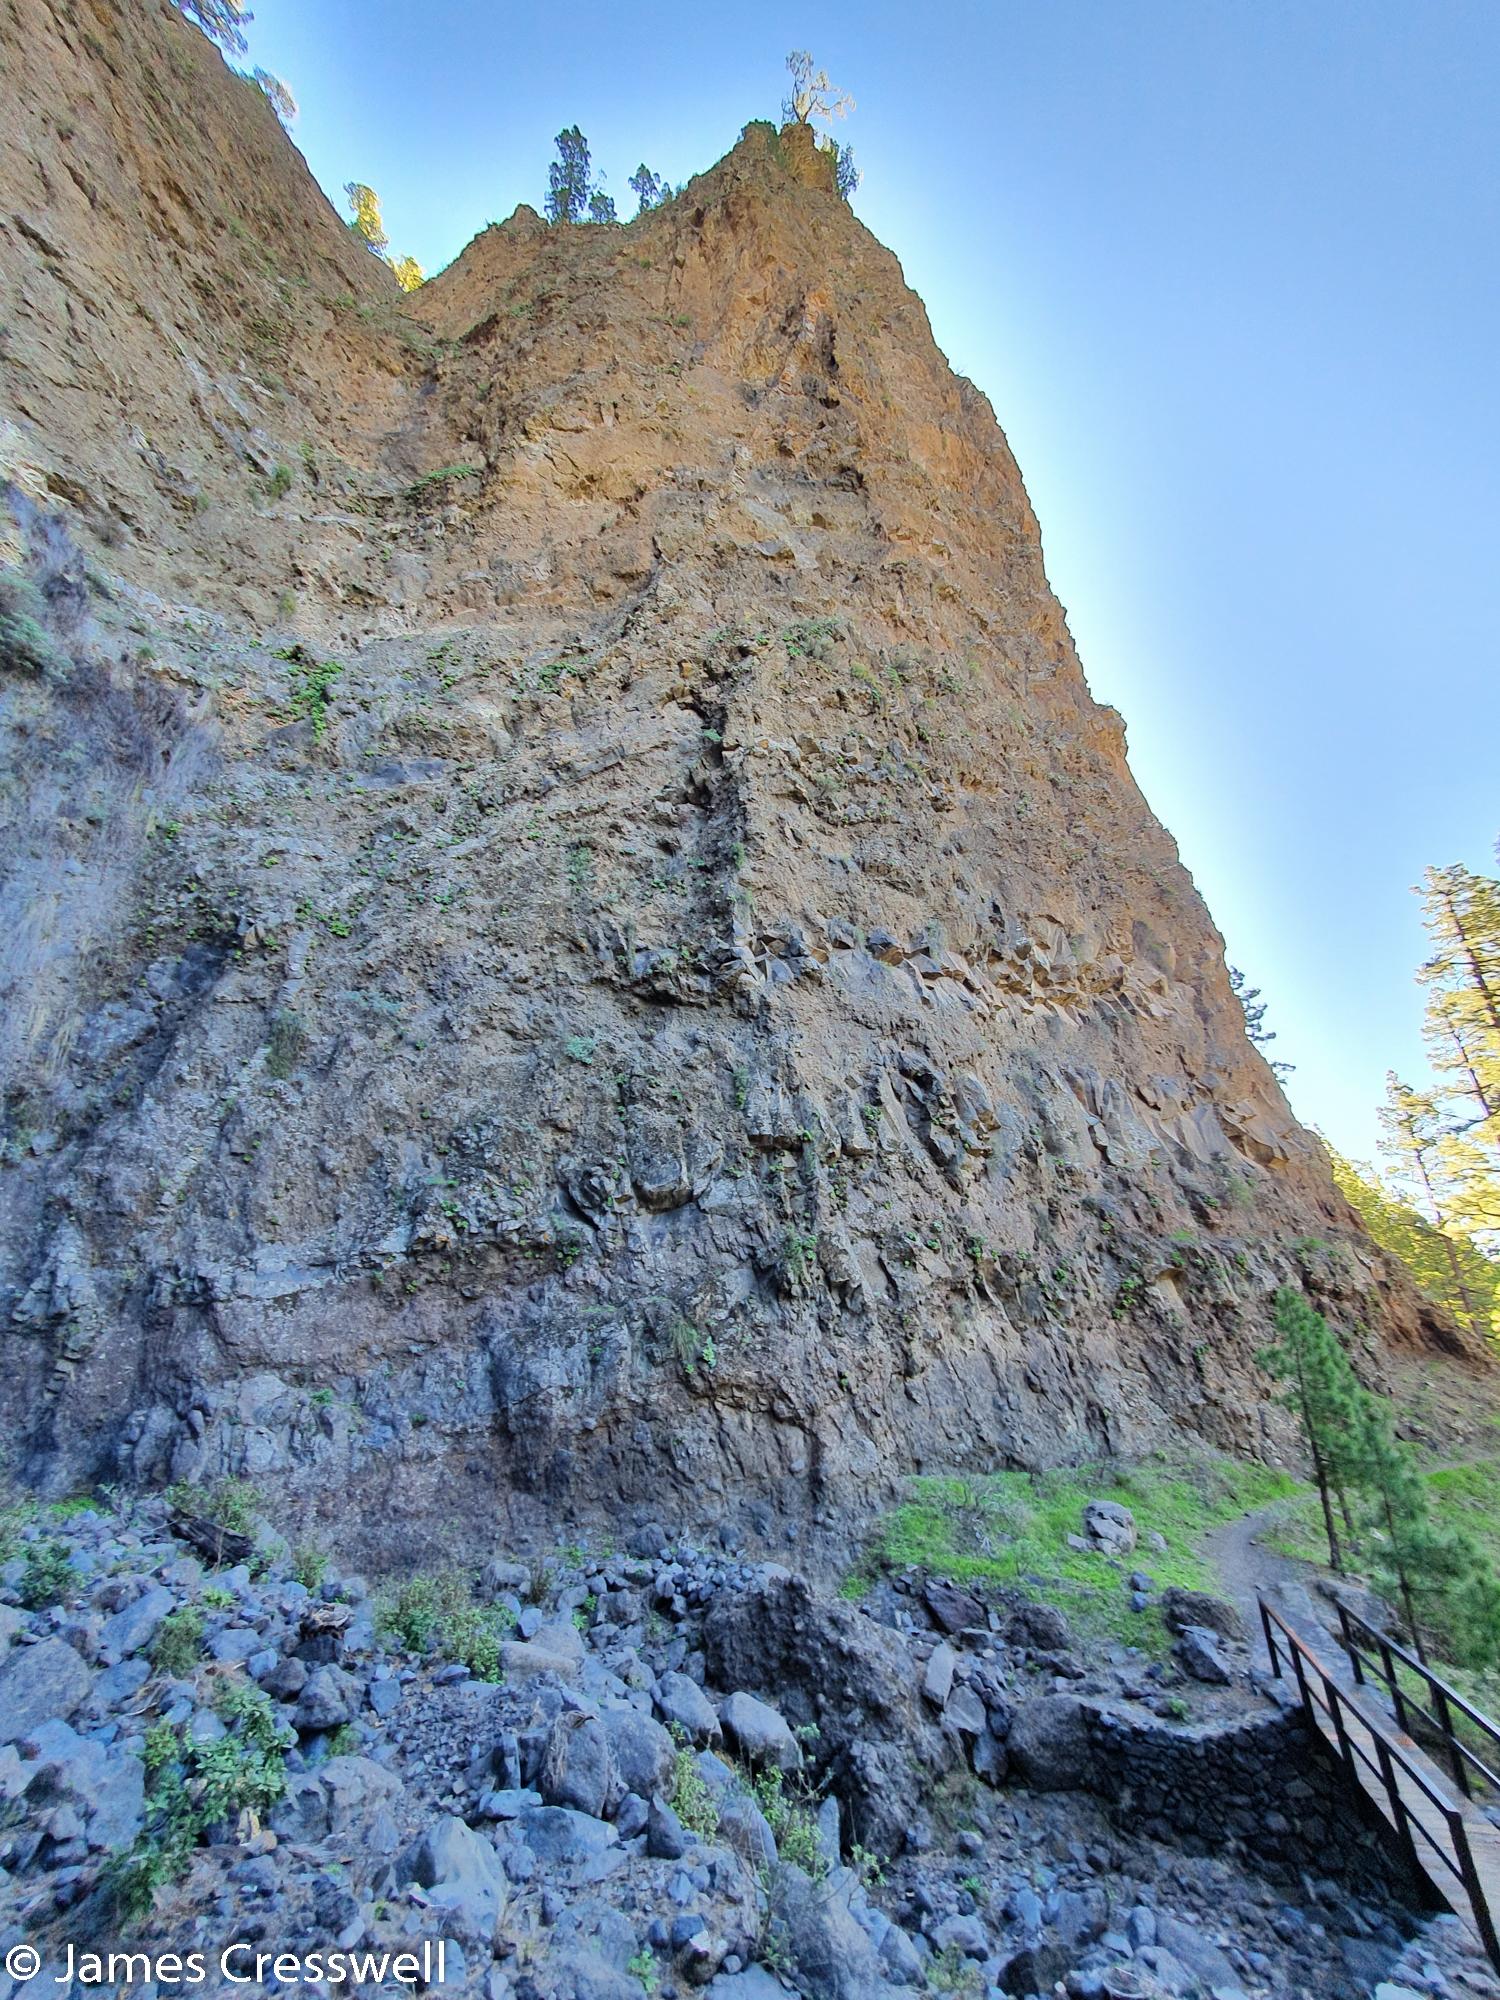 High rock face